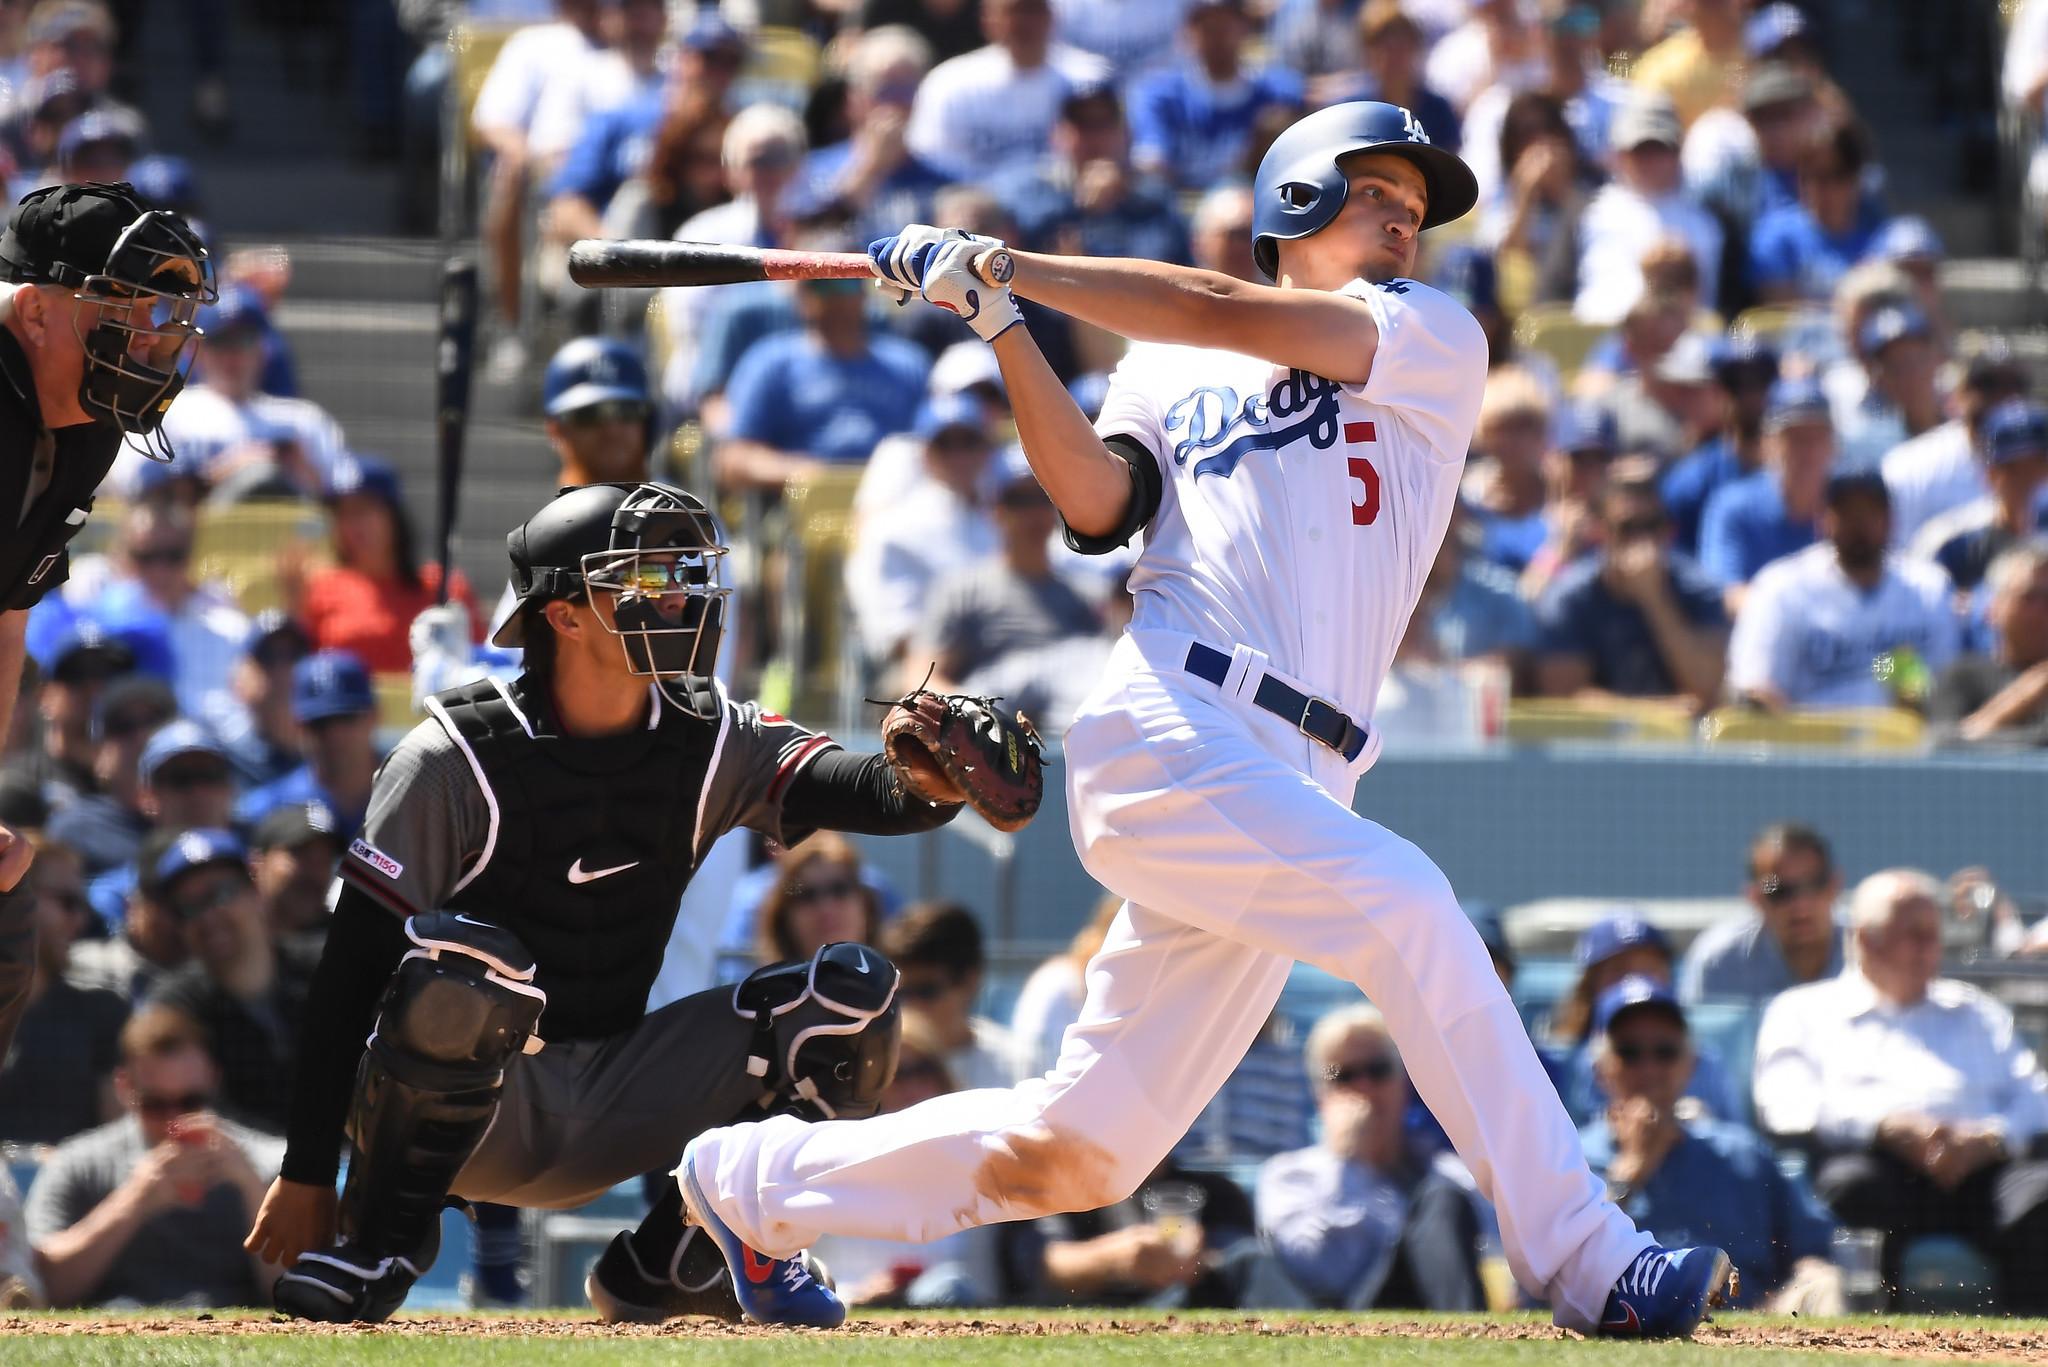 LOS ANGELES, CALIFORNIA MARCH 25, 2019-Dodgers Corey Seager hits a solo home run against Diamondback